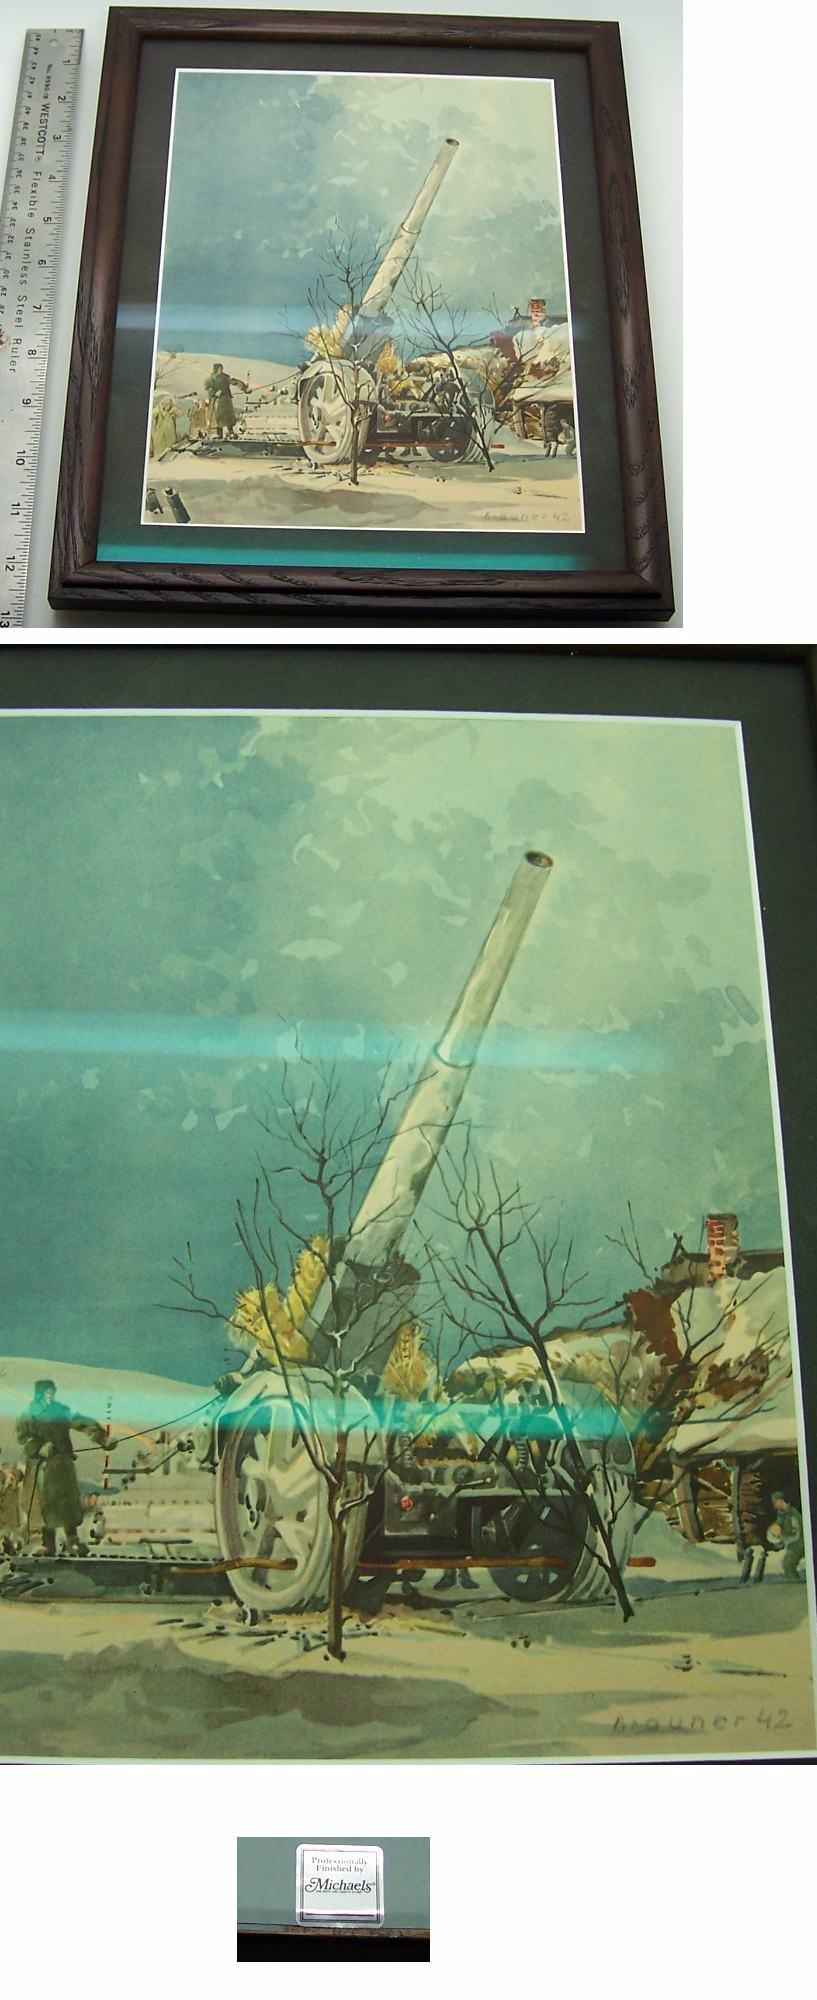 Framed Flak Print by Brauner 1942